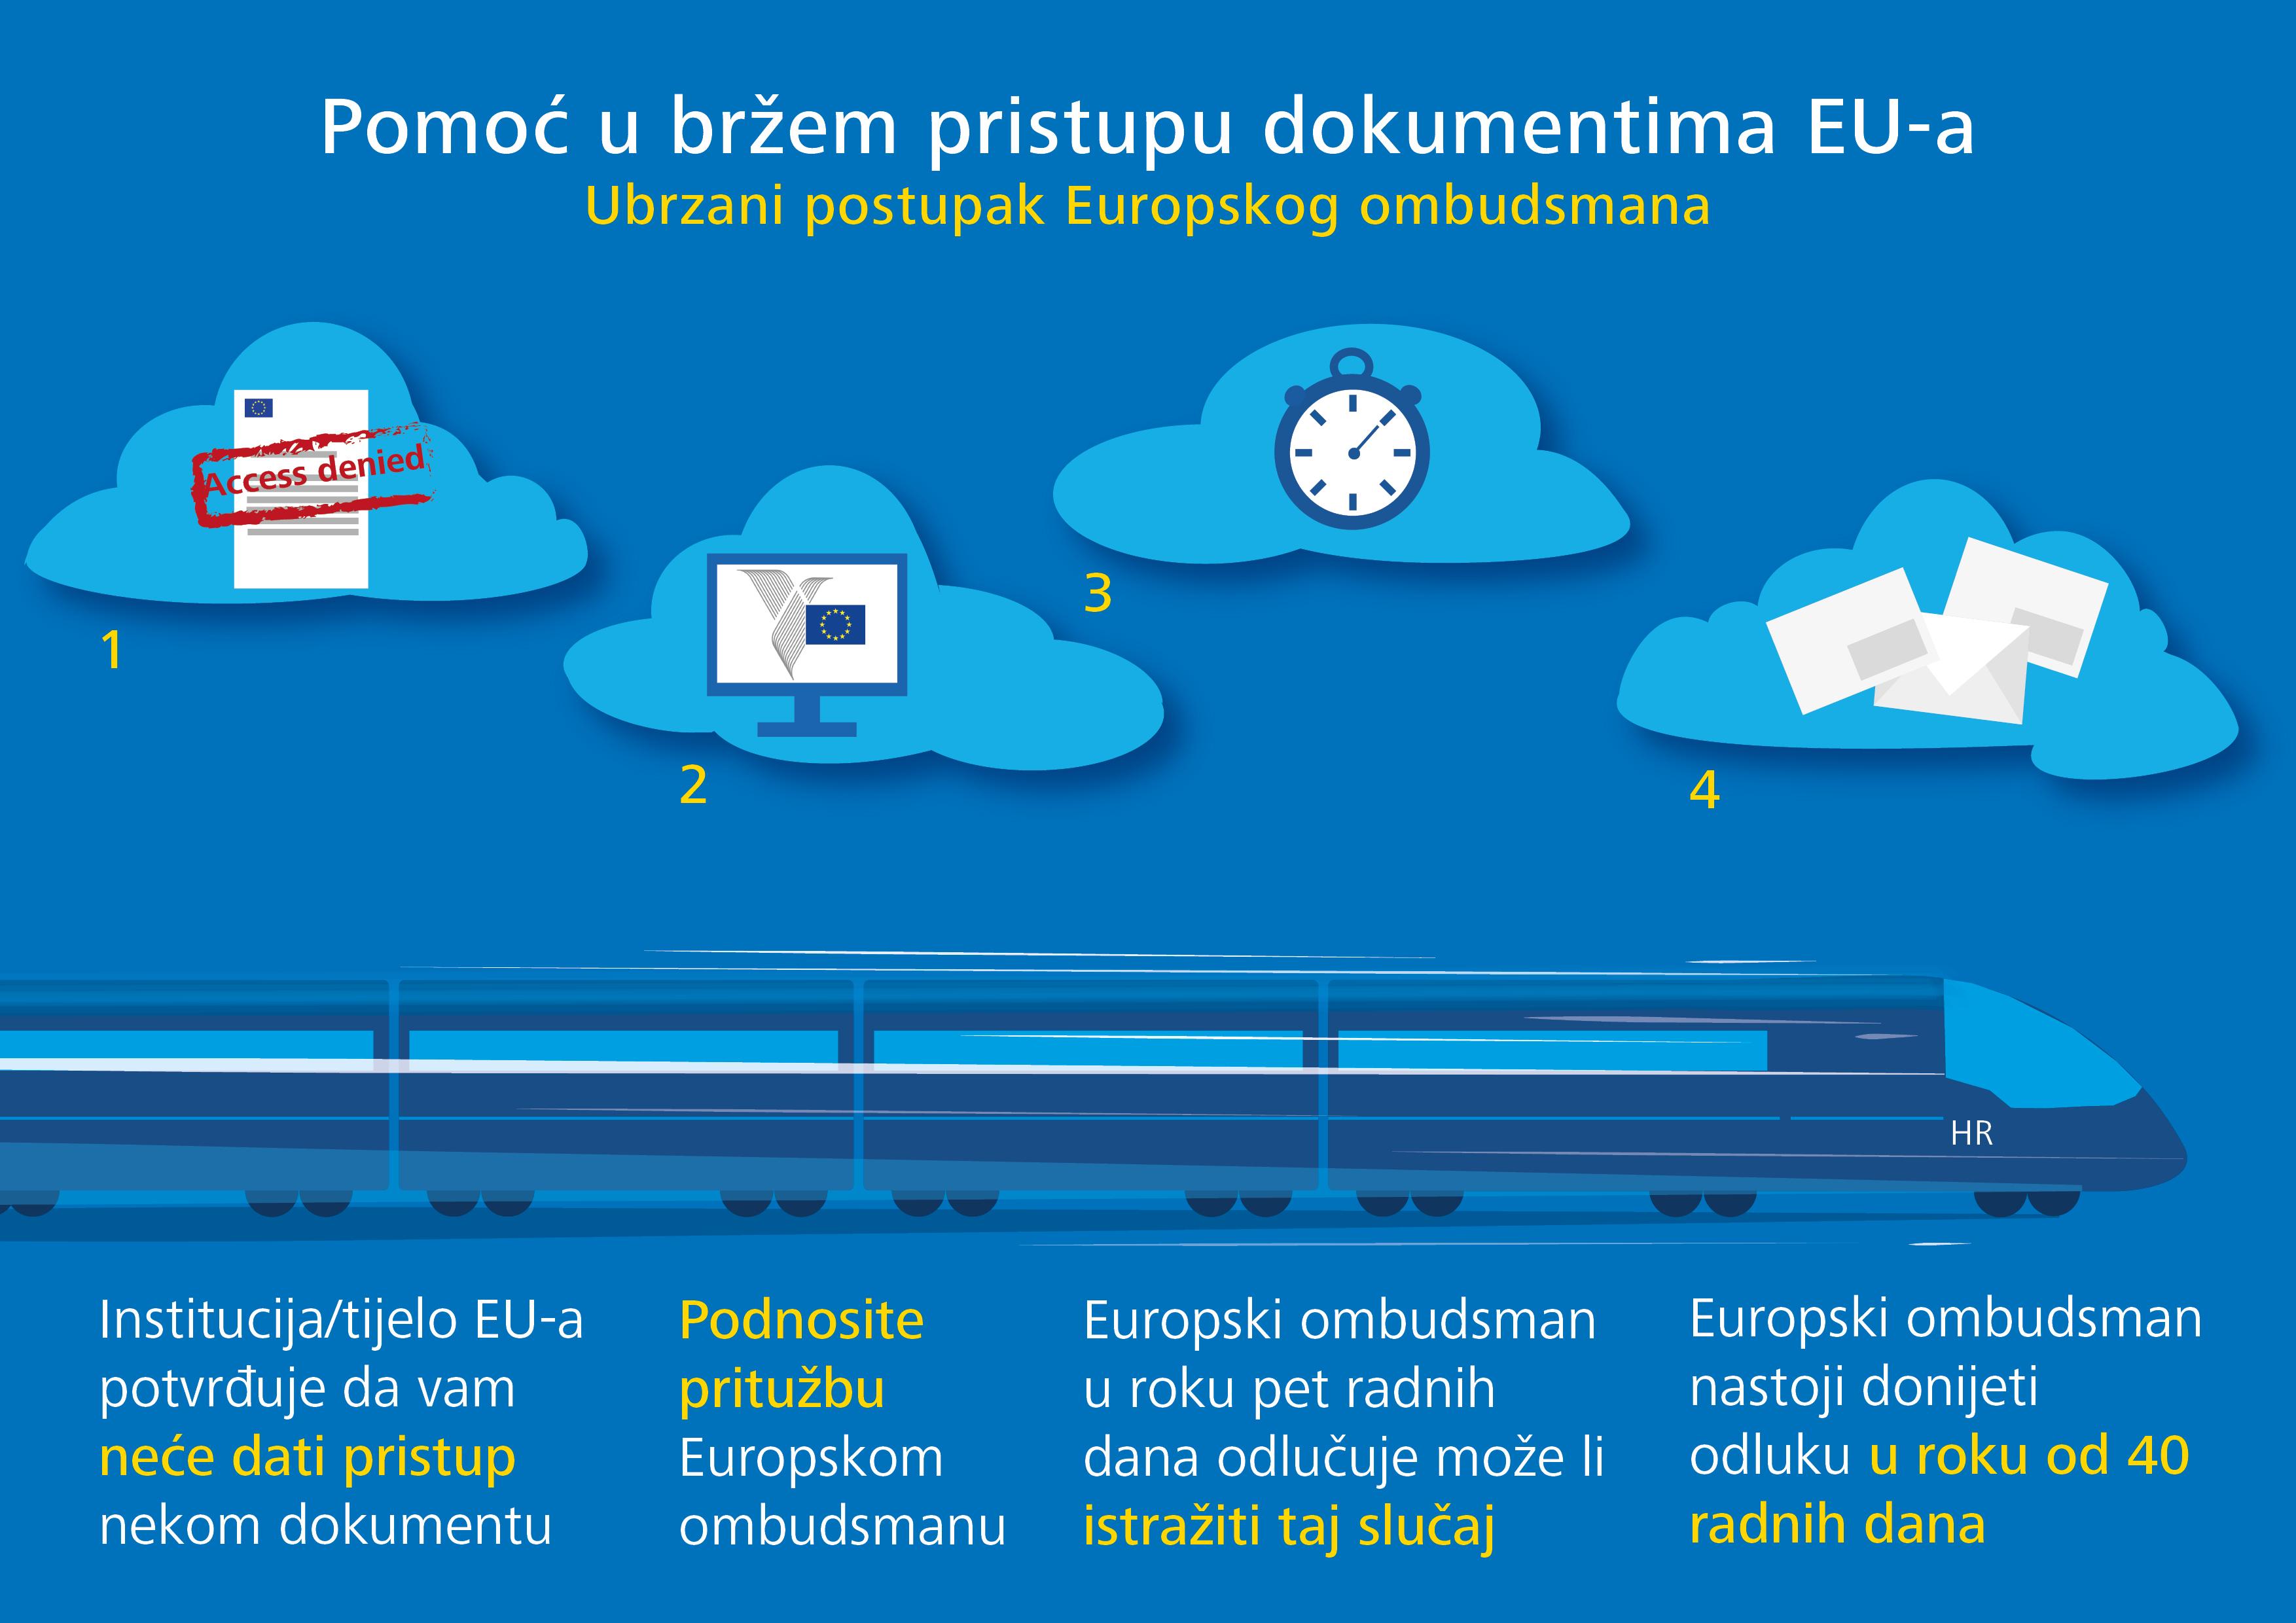 Pomoć u bržem pristupu dokumentima EU-a